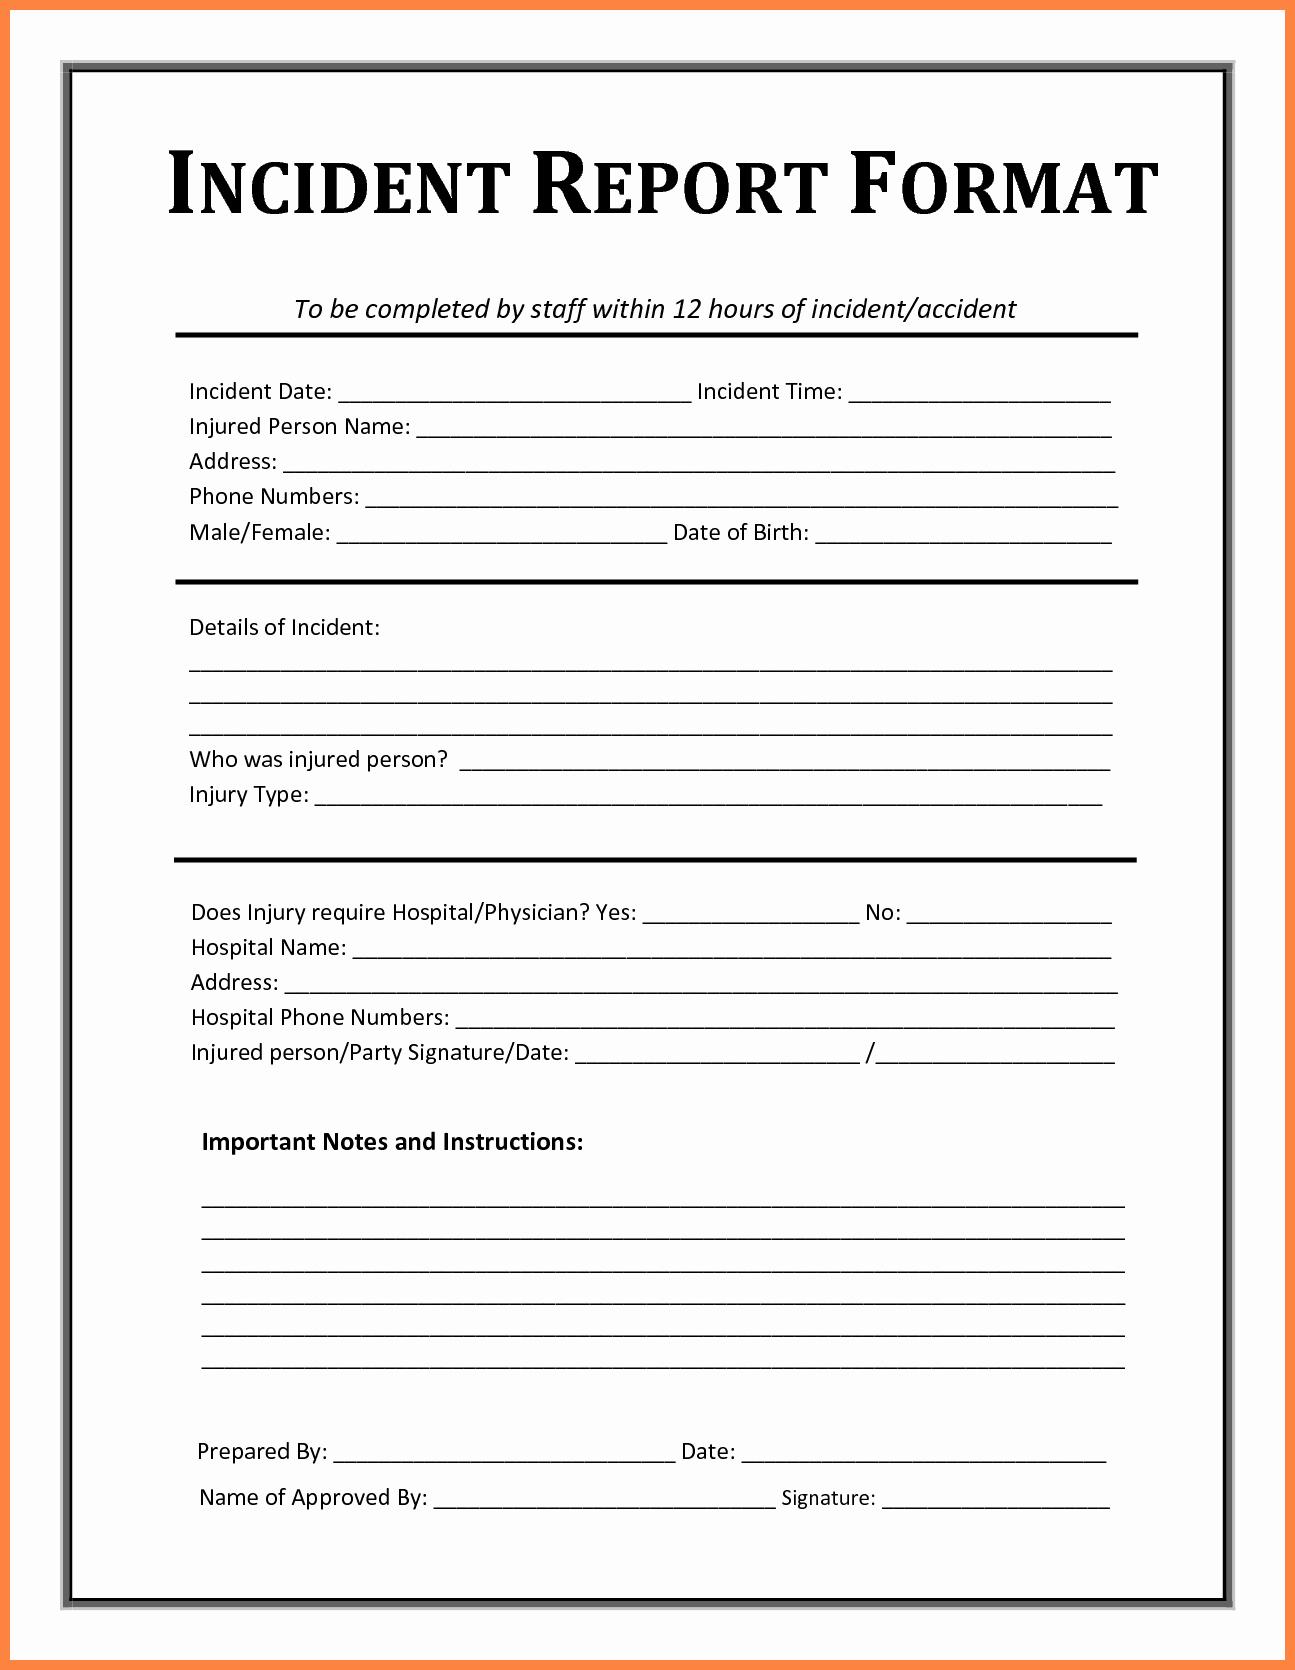 Incident Report Template Microsoft Elegant Incident Report Template Free Incident Report Templates